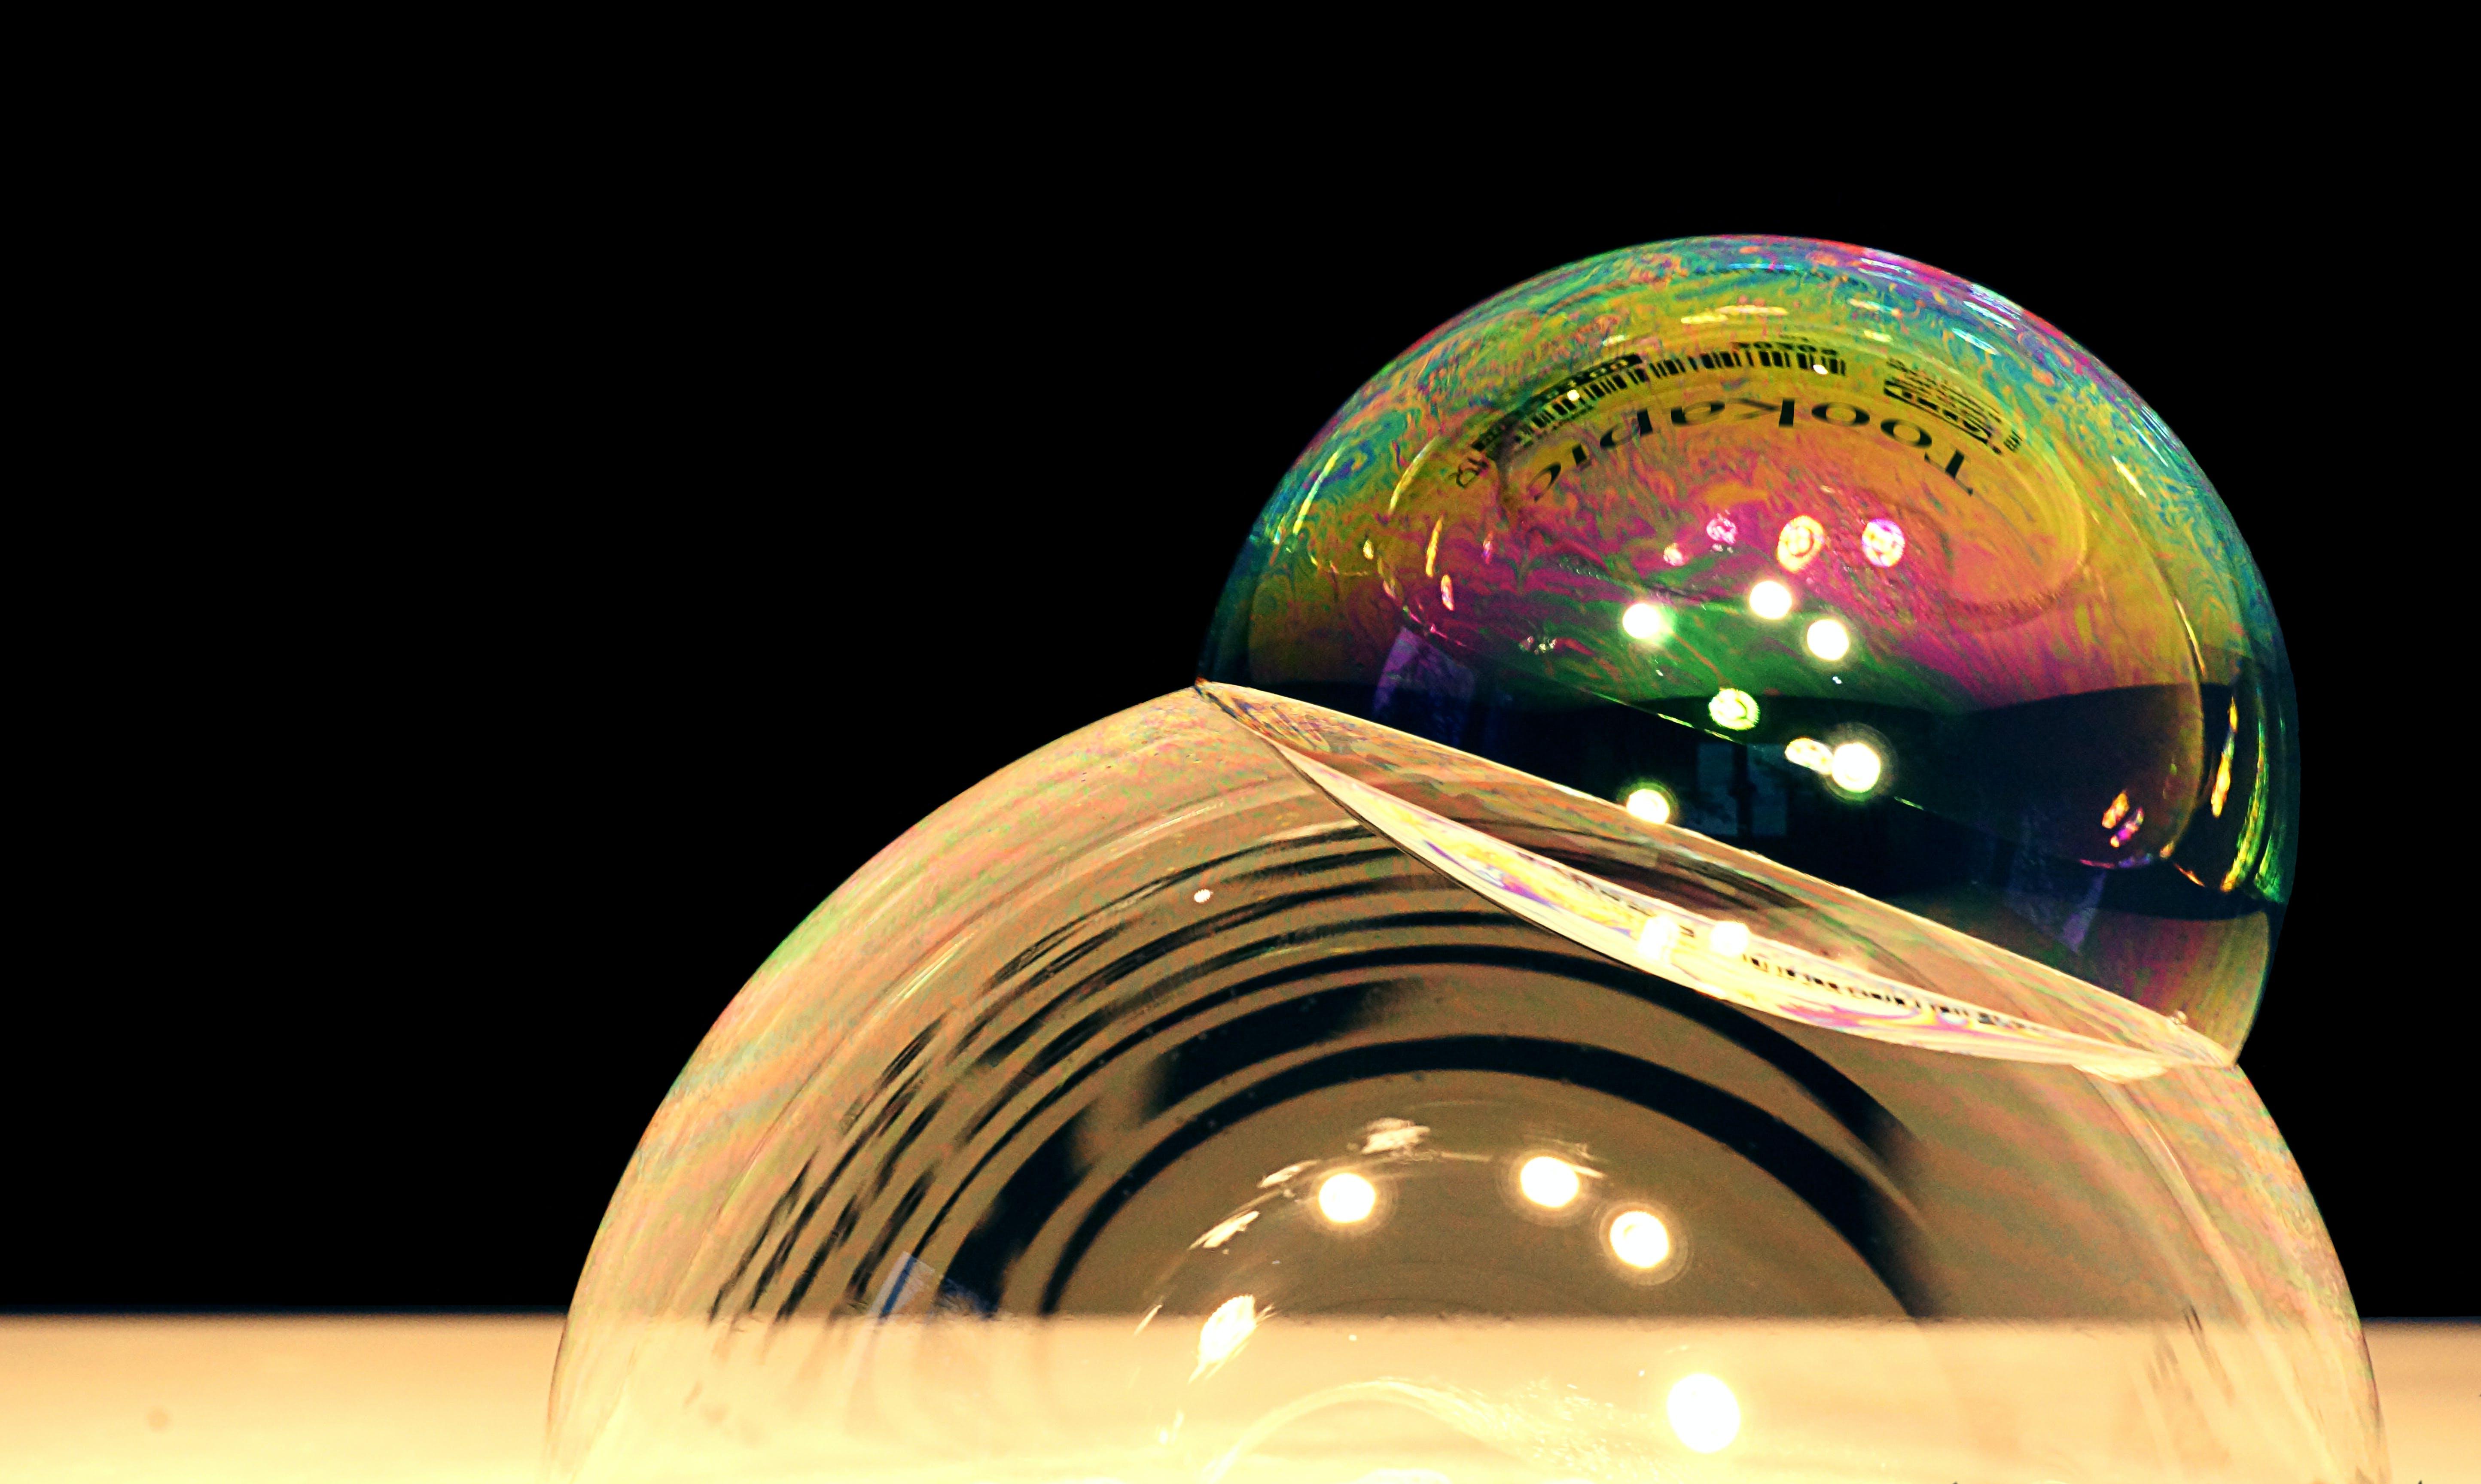 Free stock photo of bubble, tookapic